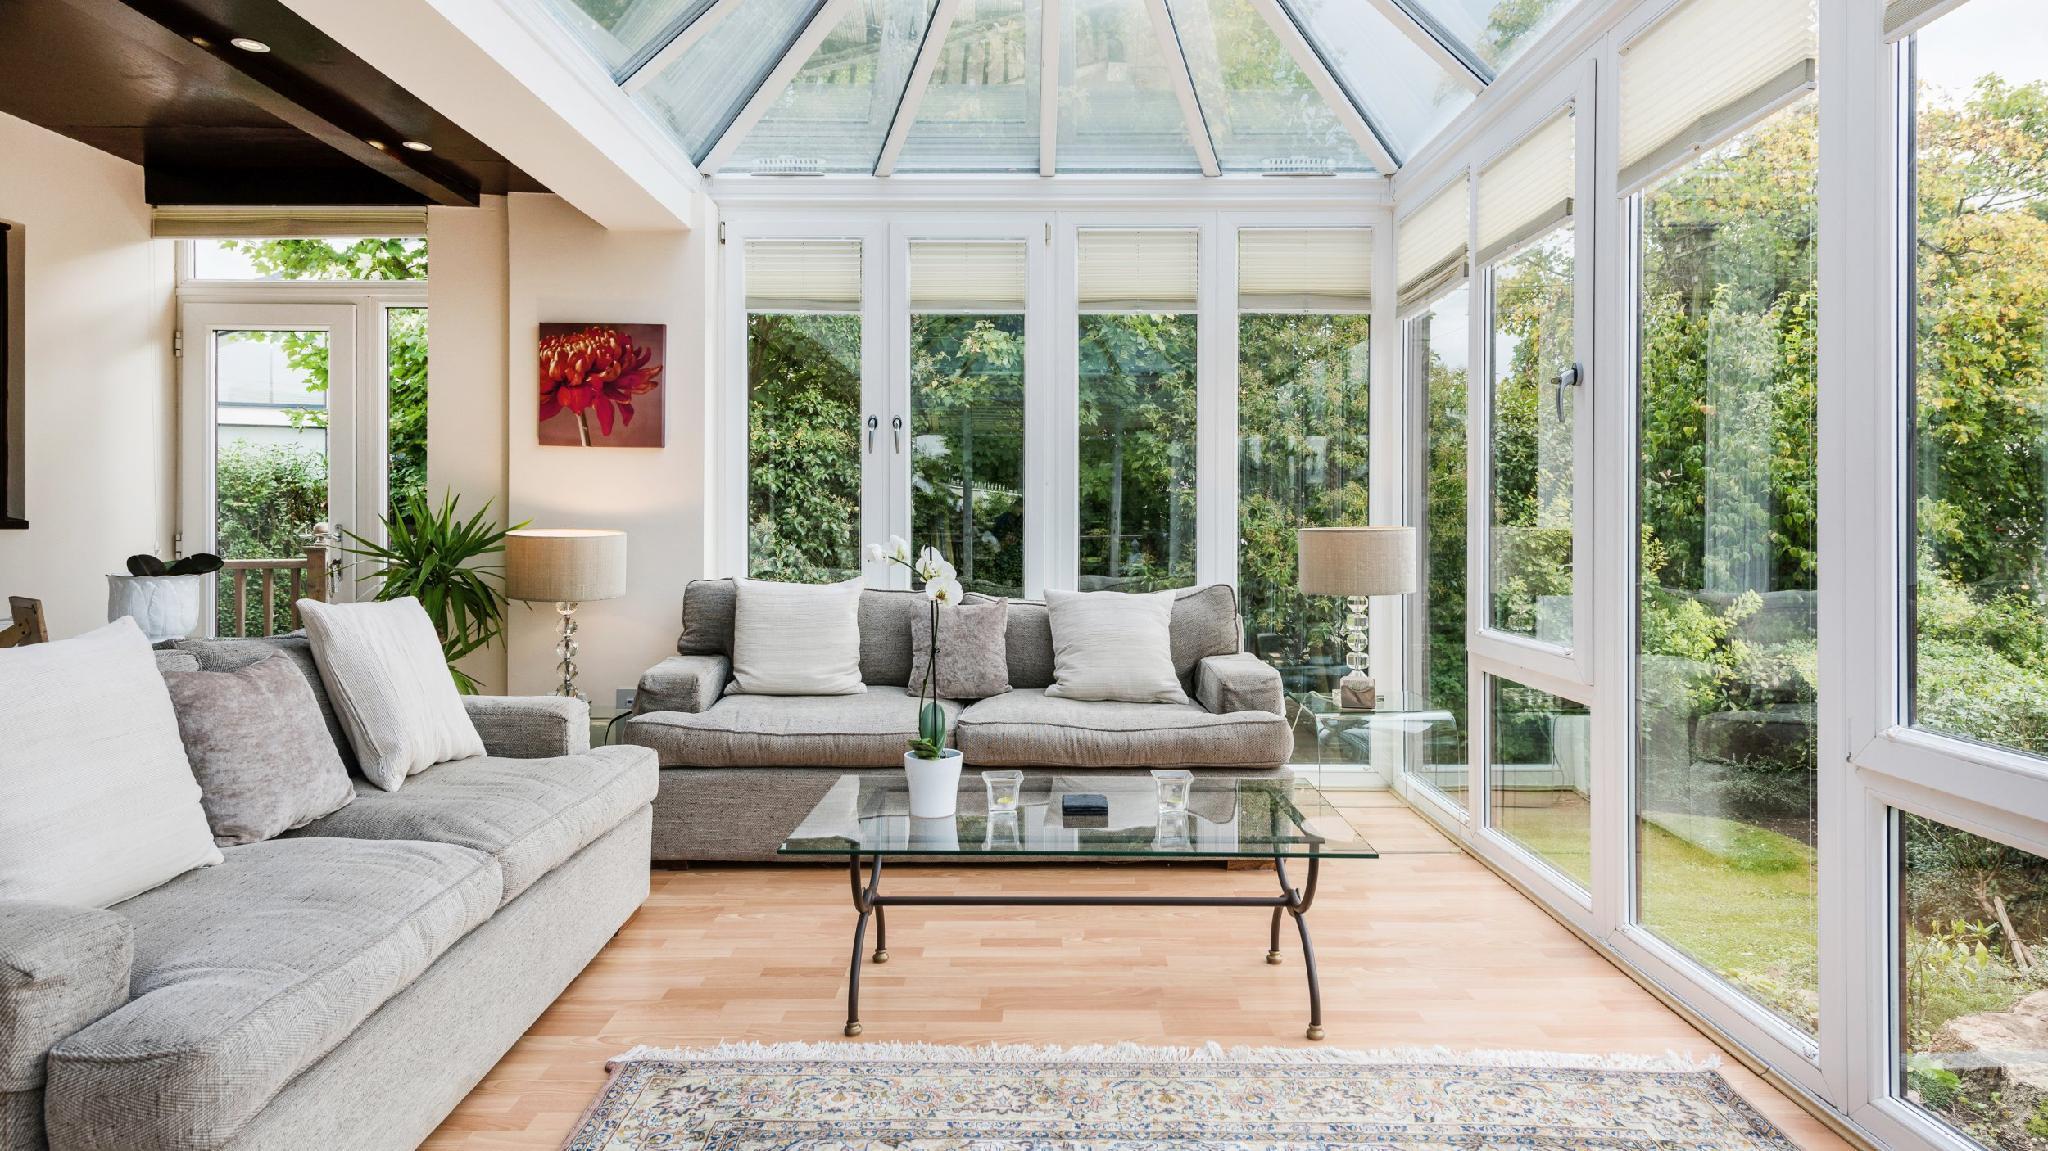 Luxury Riverside Home, Near Windsor Castle Legoland London Within 20 Minutes